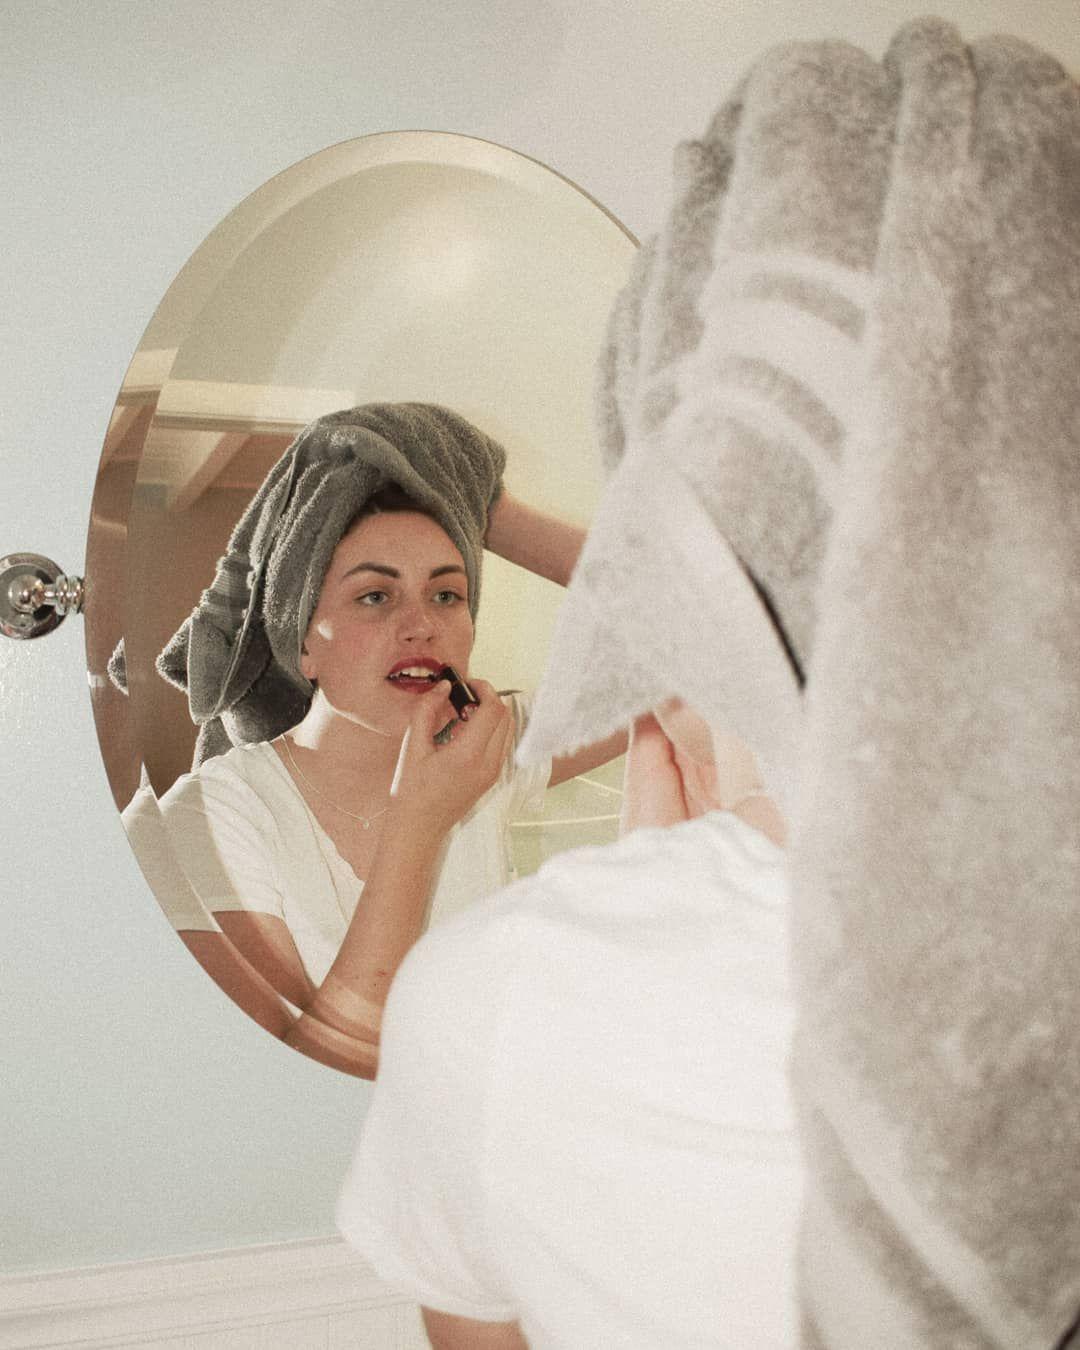 Insta Shotbynatalia Retro Photoshoot Bathroom Photoshoot Mirror Photography Mirror Photography Photography Debut Photoshoot